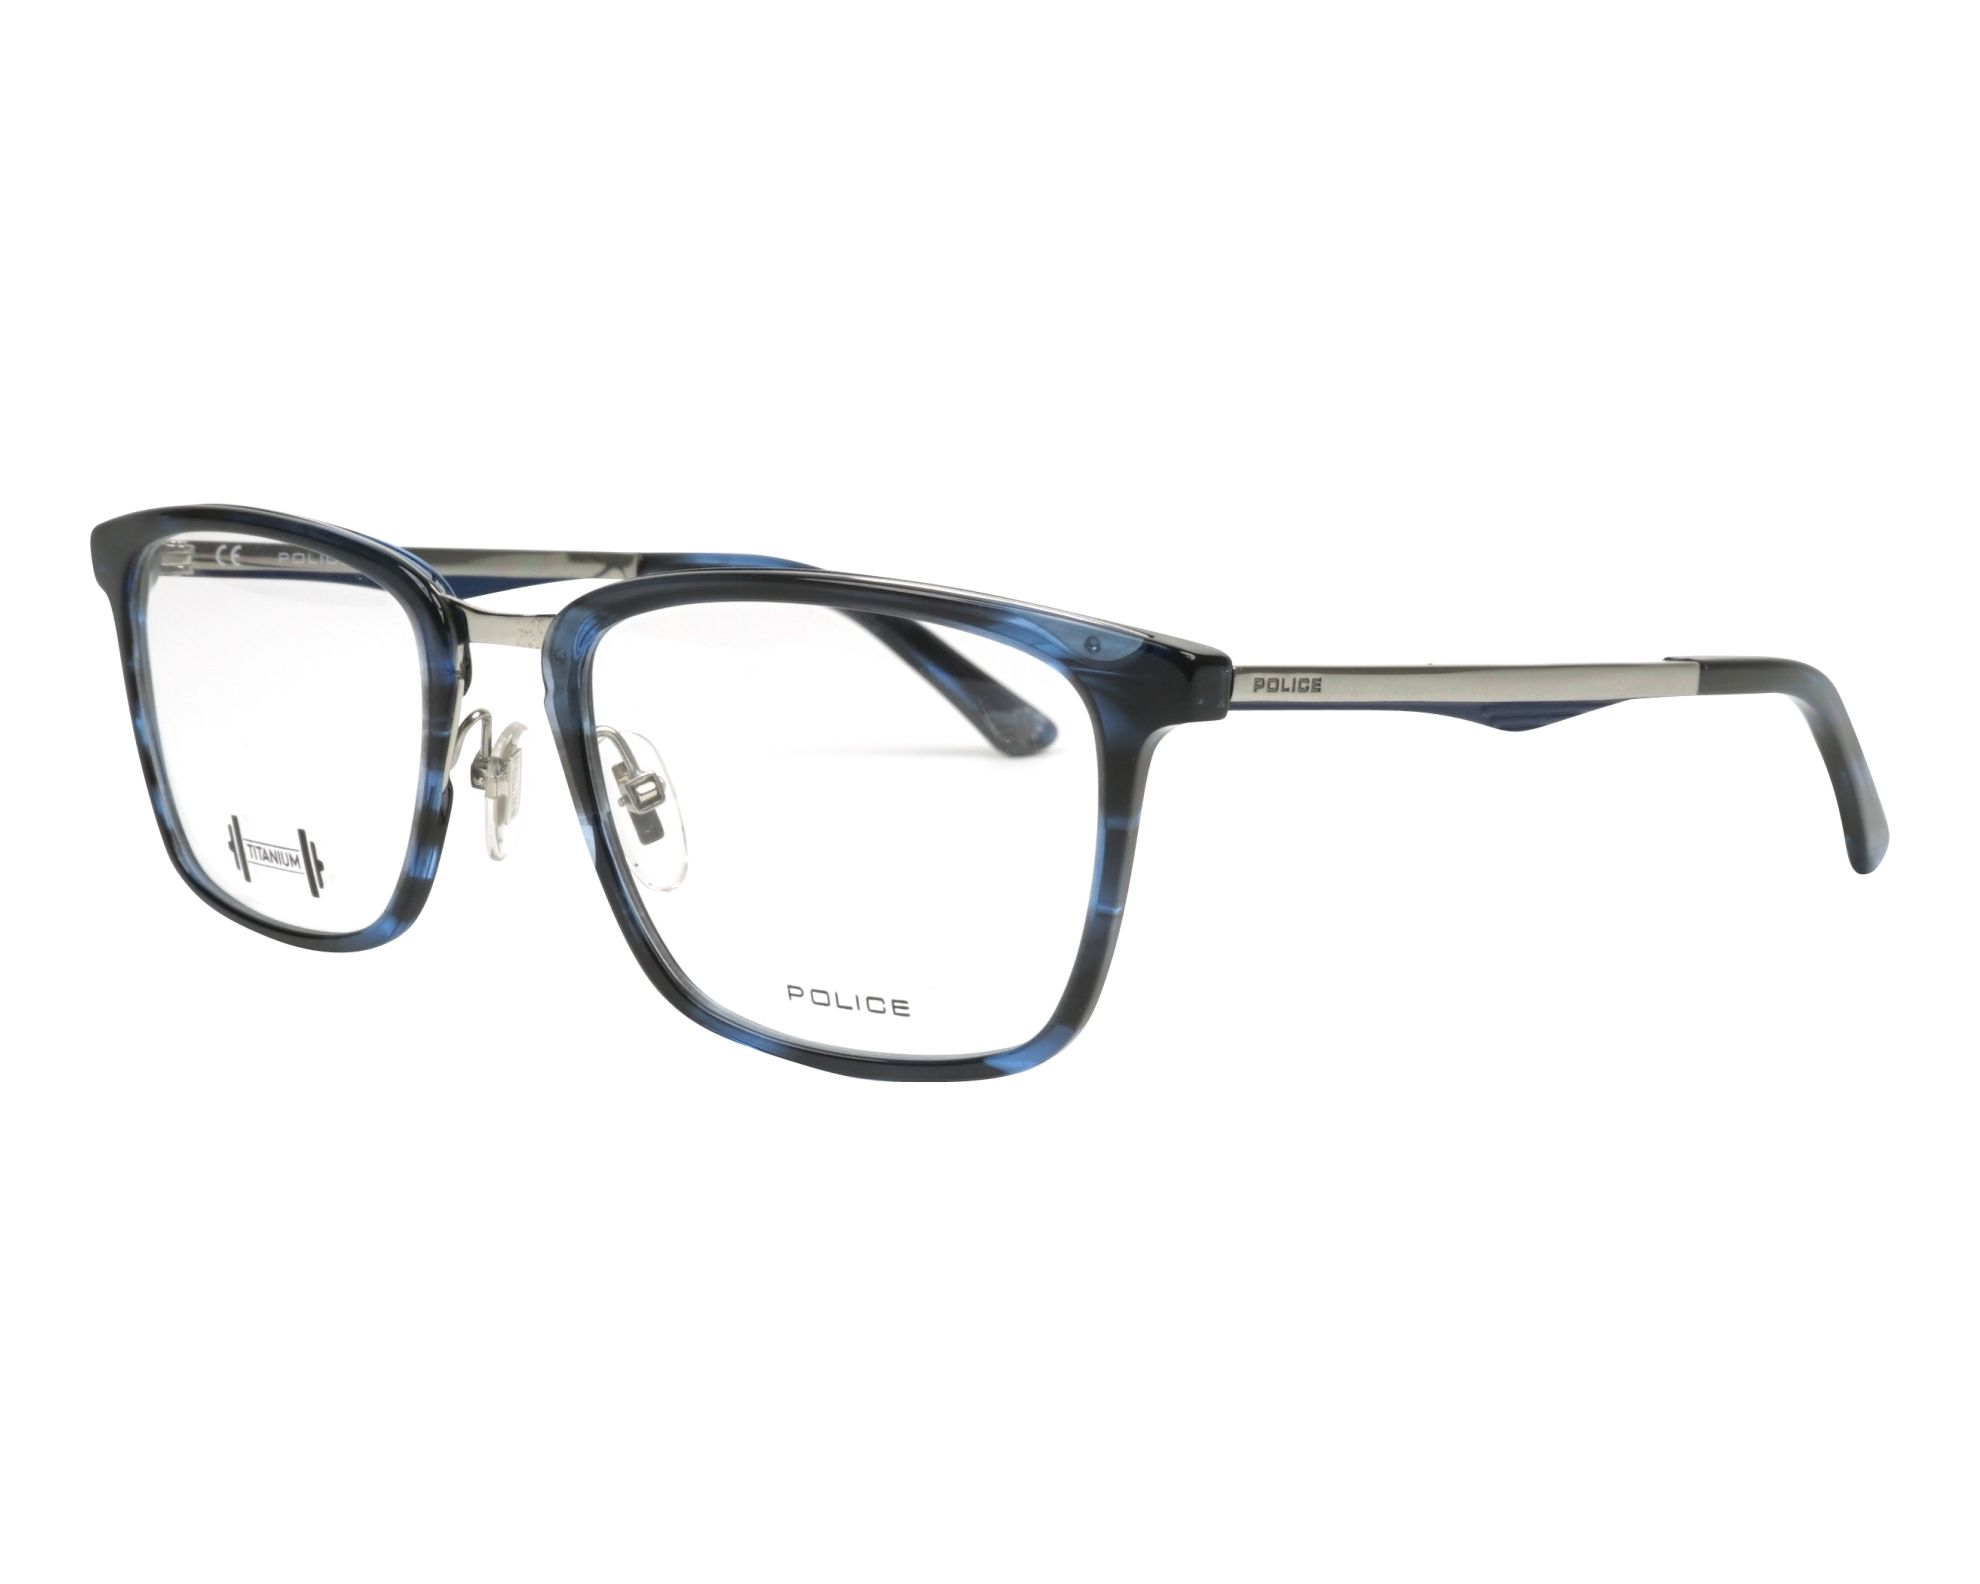 Police Glasses Blackbird Ti 2 Vpl 684 9n4m